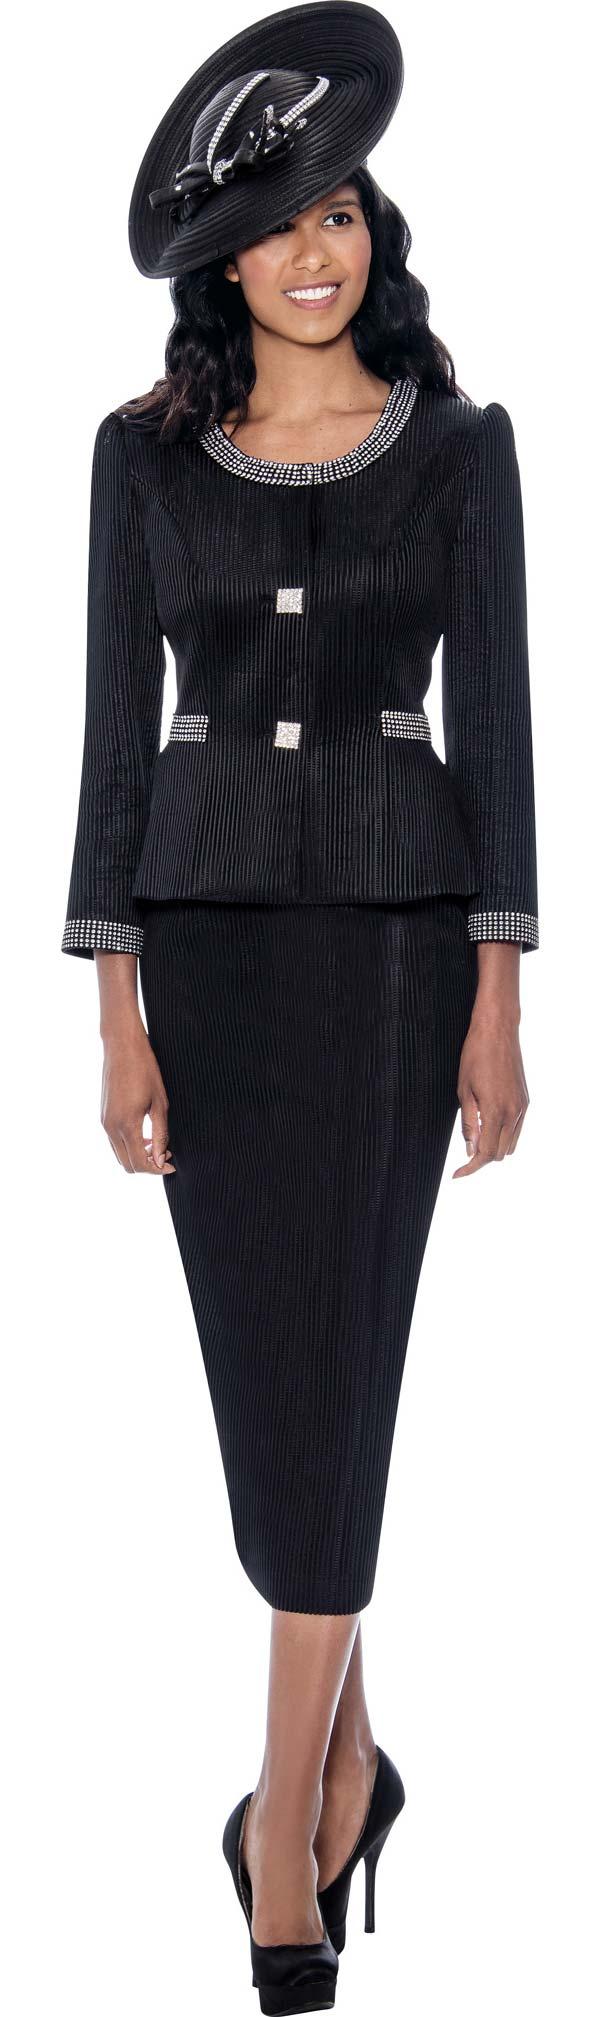 GMI G8212-Black - Textured Look Skirt Suit With Rhinestone Trimmed Slight Hi-Lo Jacket